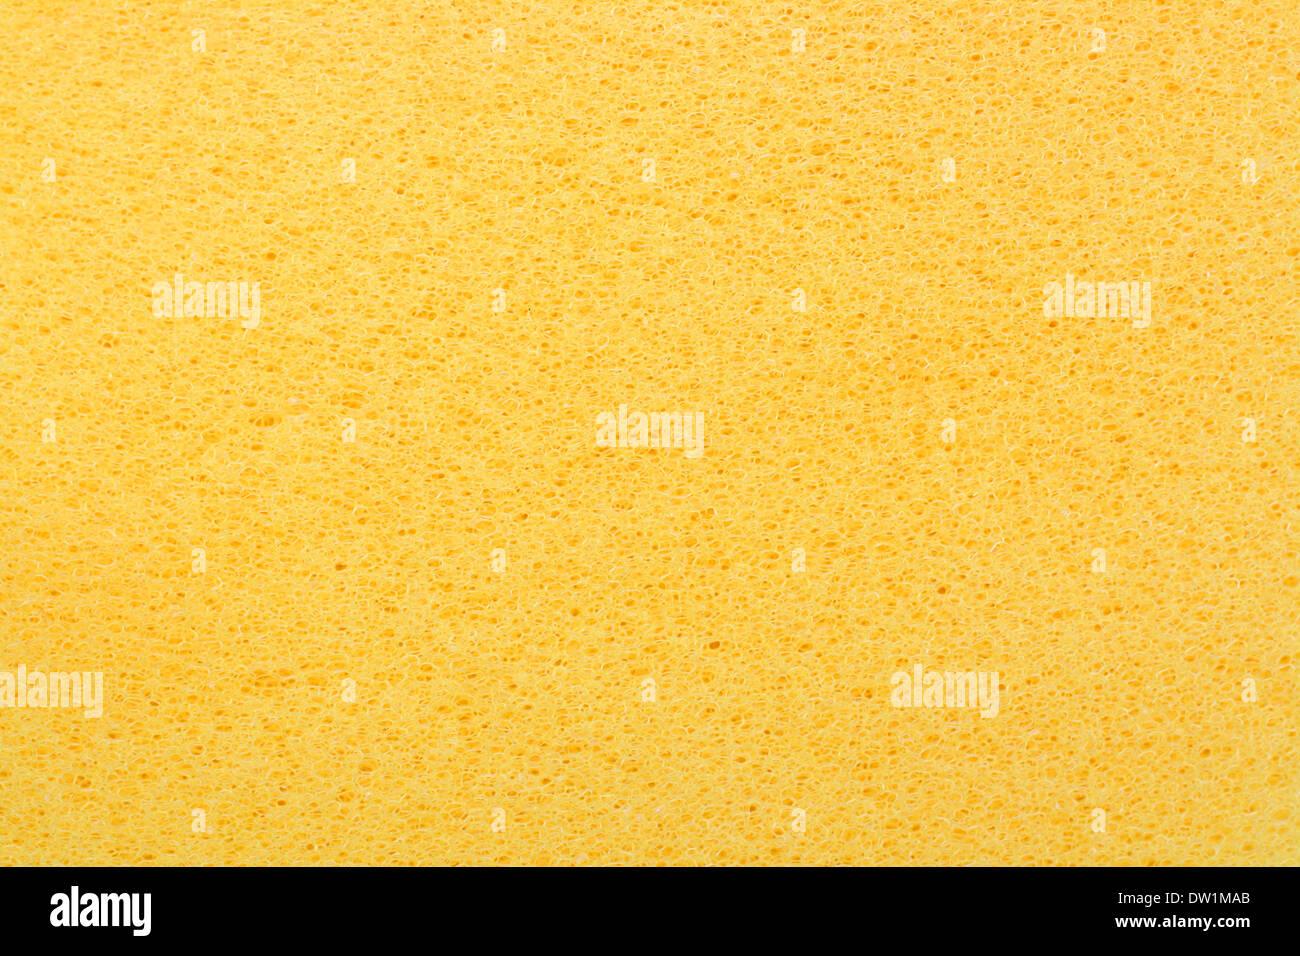 porous surface stock photos porous surface stock images alamy